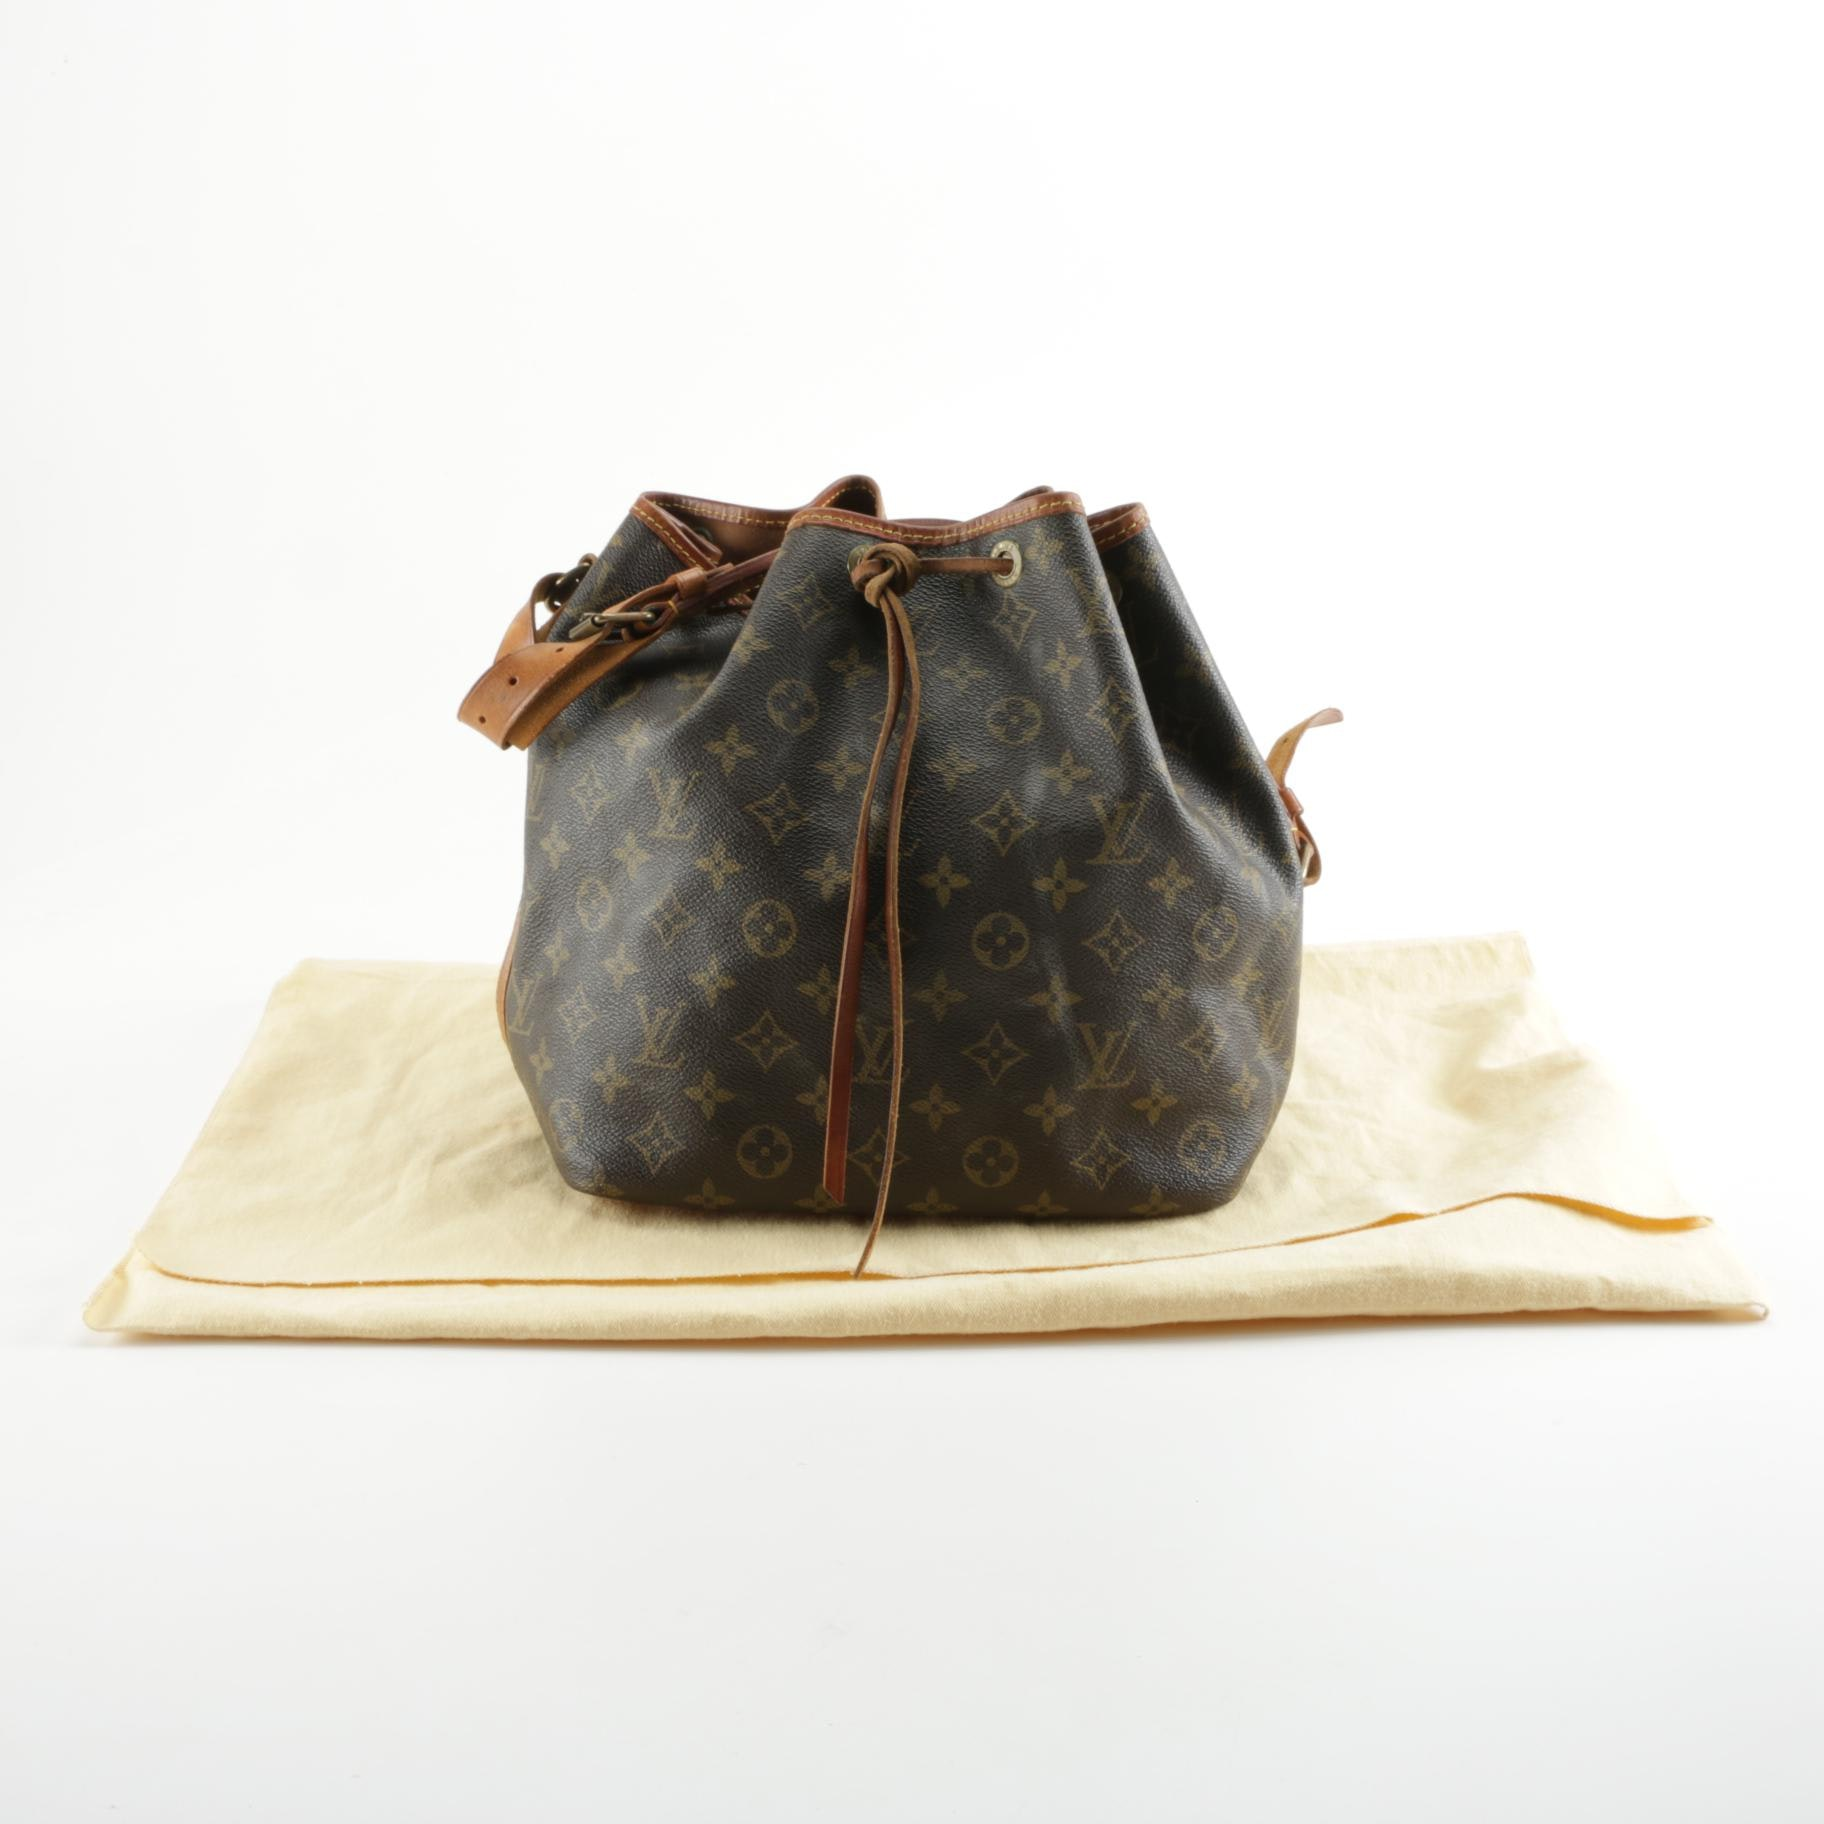 1980s Louis Vuitton Monogram Petit Noe Bag